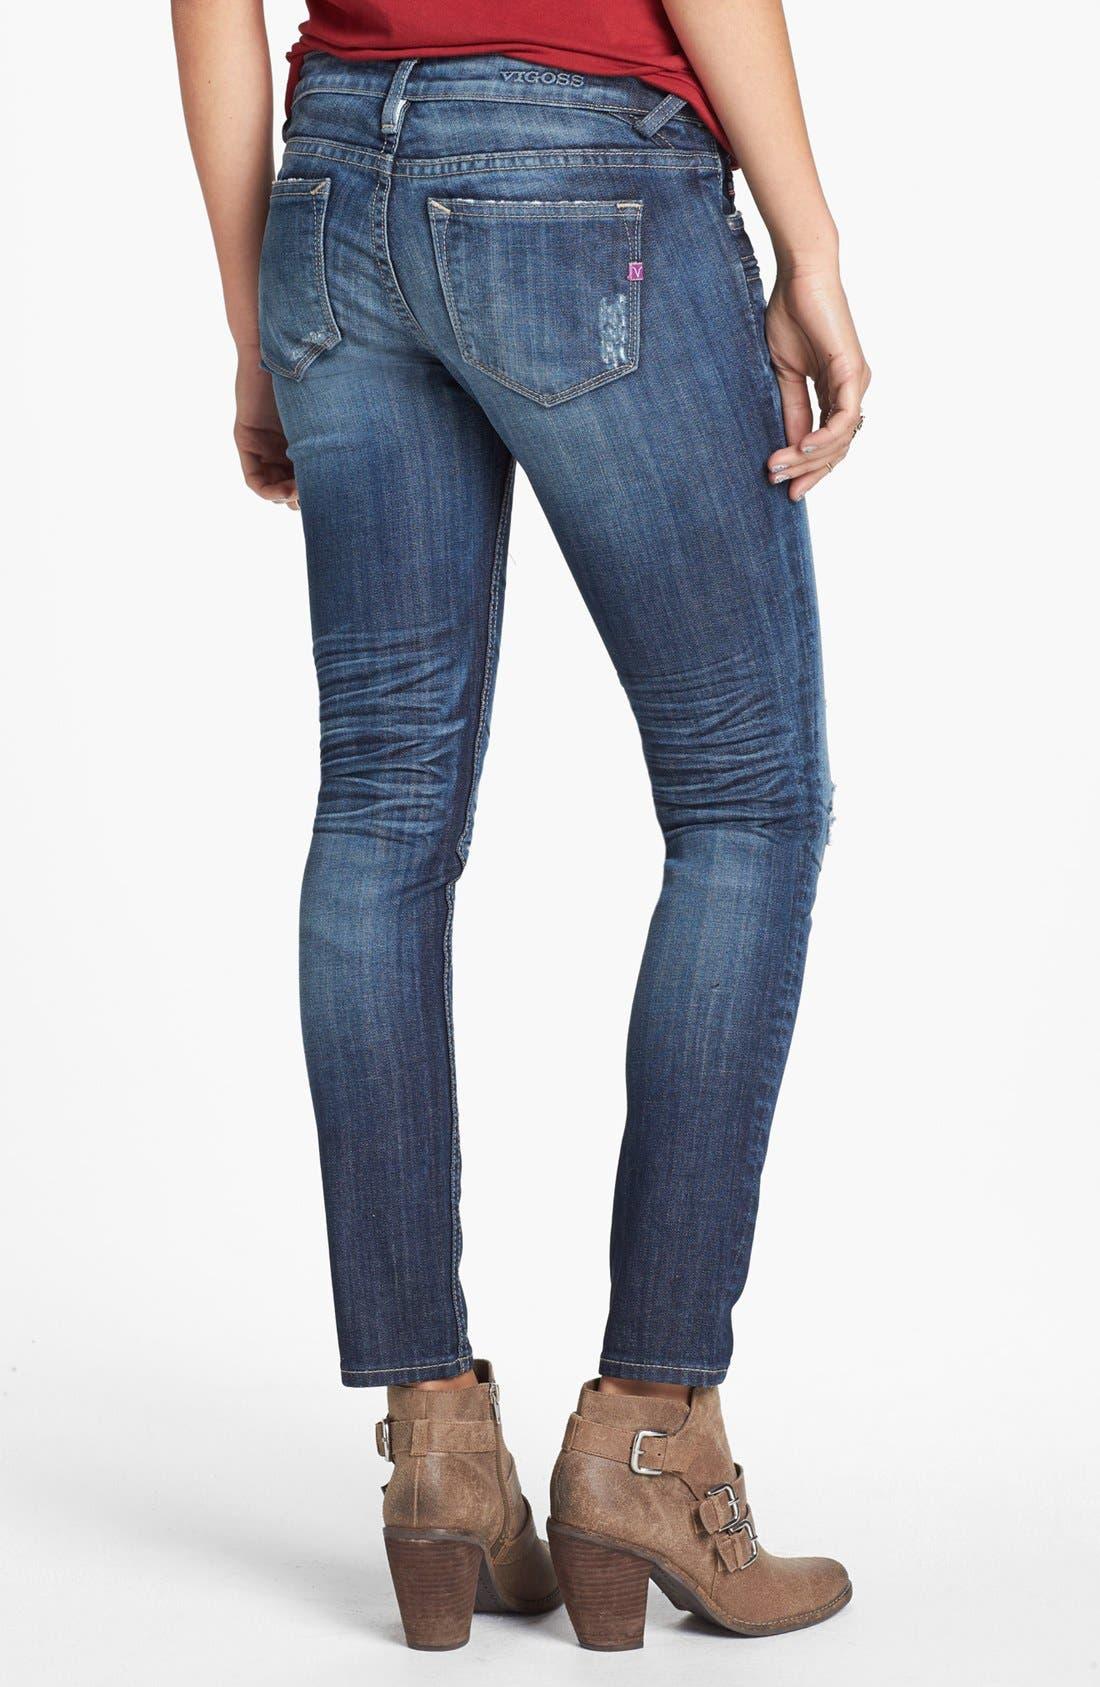 Alternate Image 2  - Vigoss Deconstructed Skinny Jeans (Dark Wash) (Juniors) (Online Only)